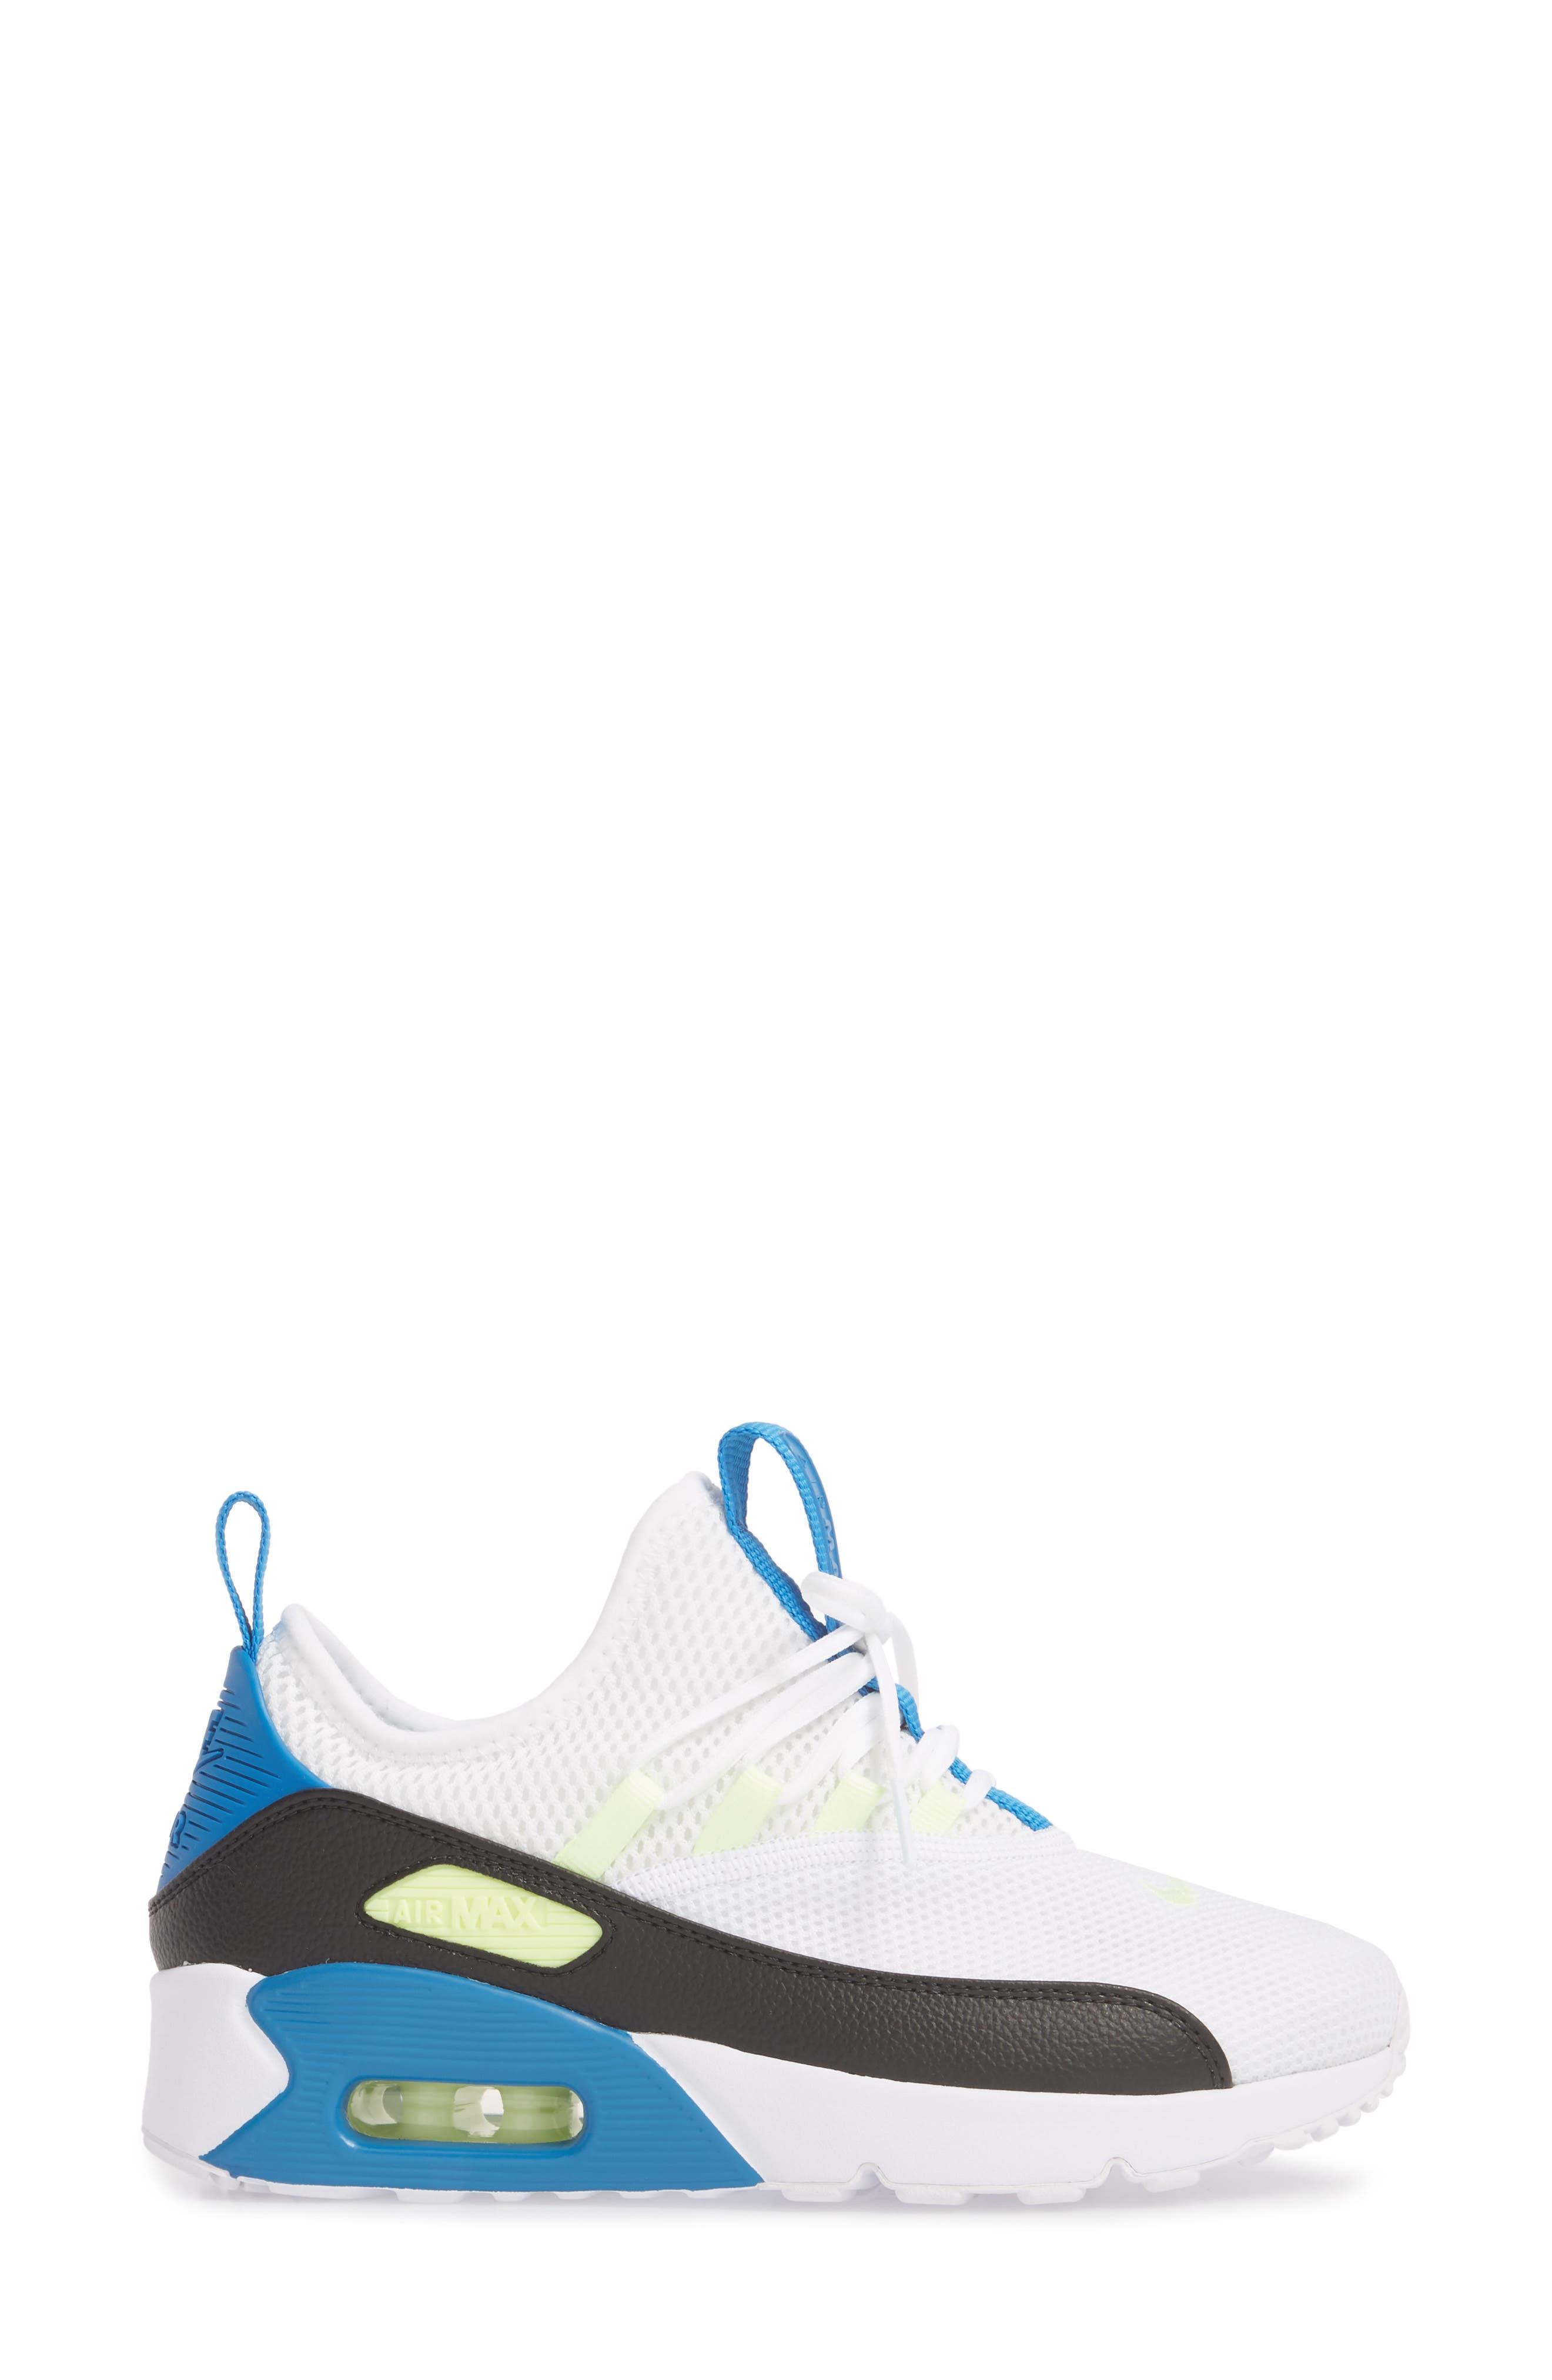 Air Max 90 EZ Sneaker,                             Alternate thumbnail 3, color,                             White/ Black/ Blue Nebula